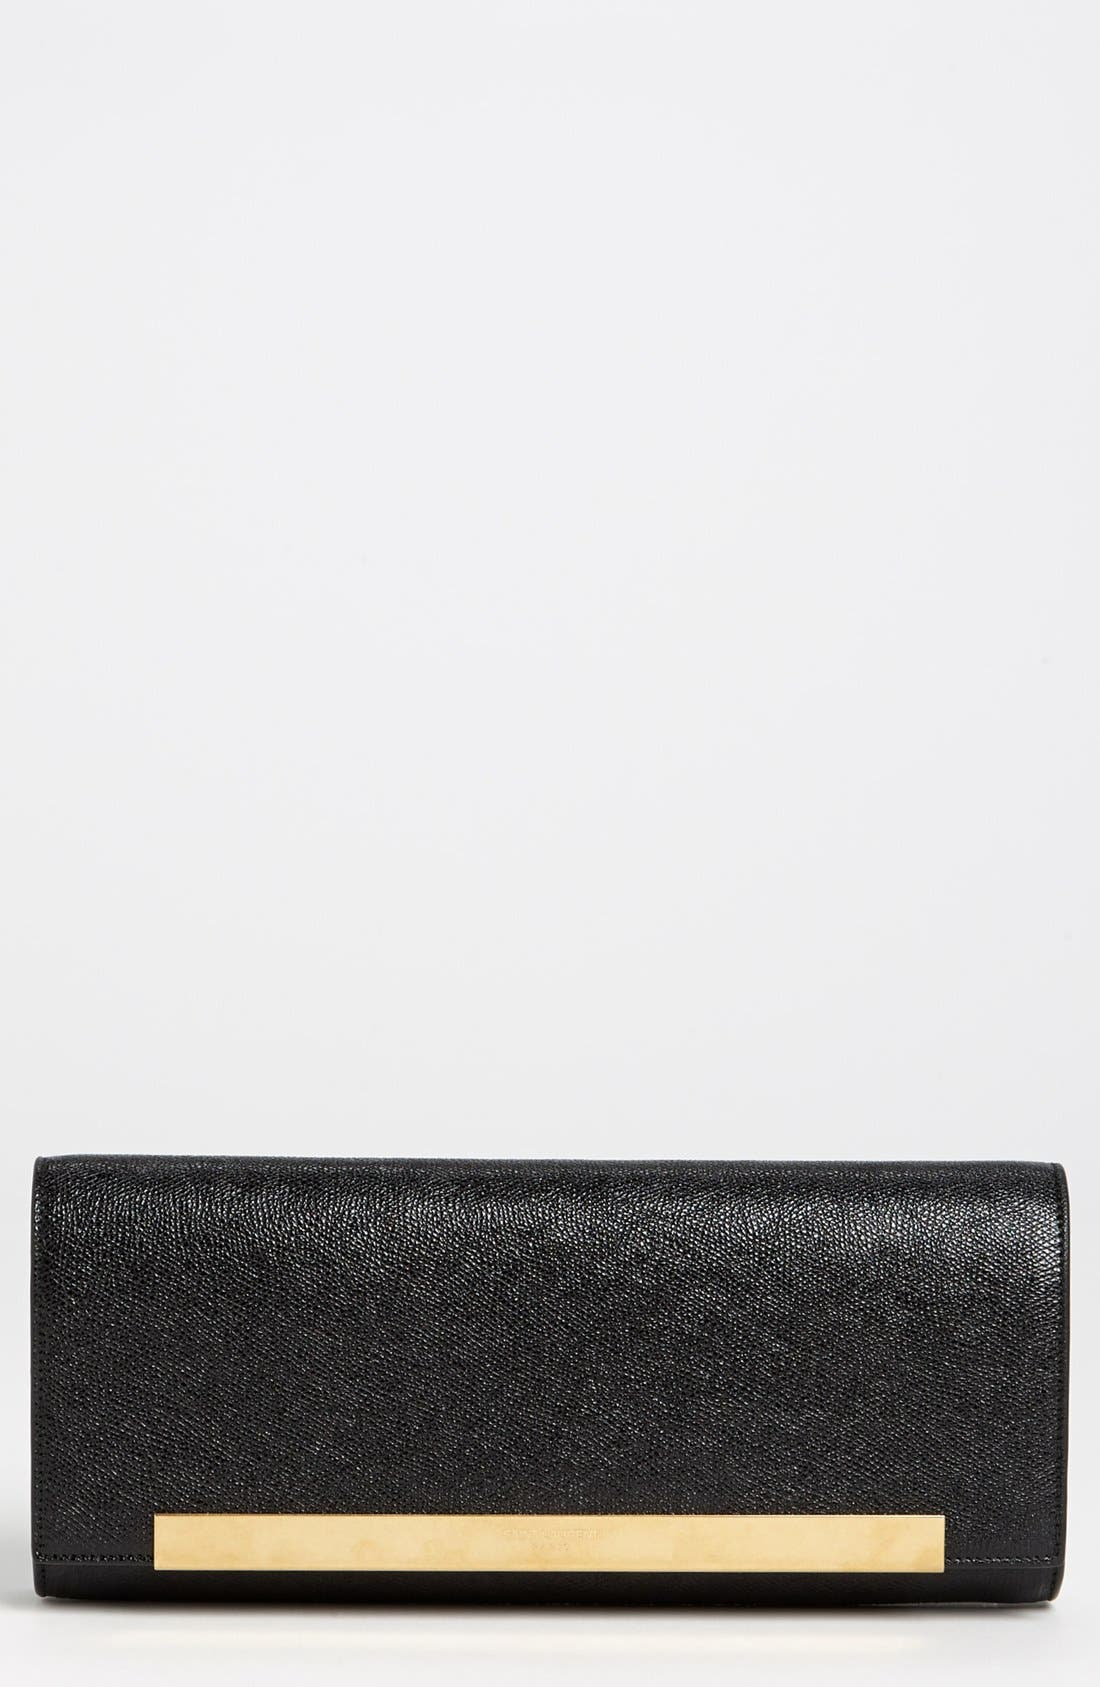 Alternate Image 1 Selected - Saint Laurent 'Lutetia - Palmellato' Leather Clutch